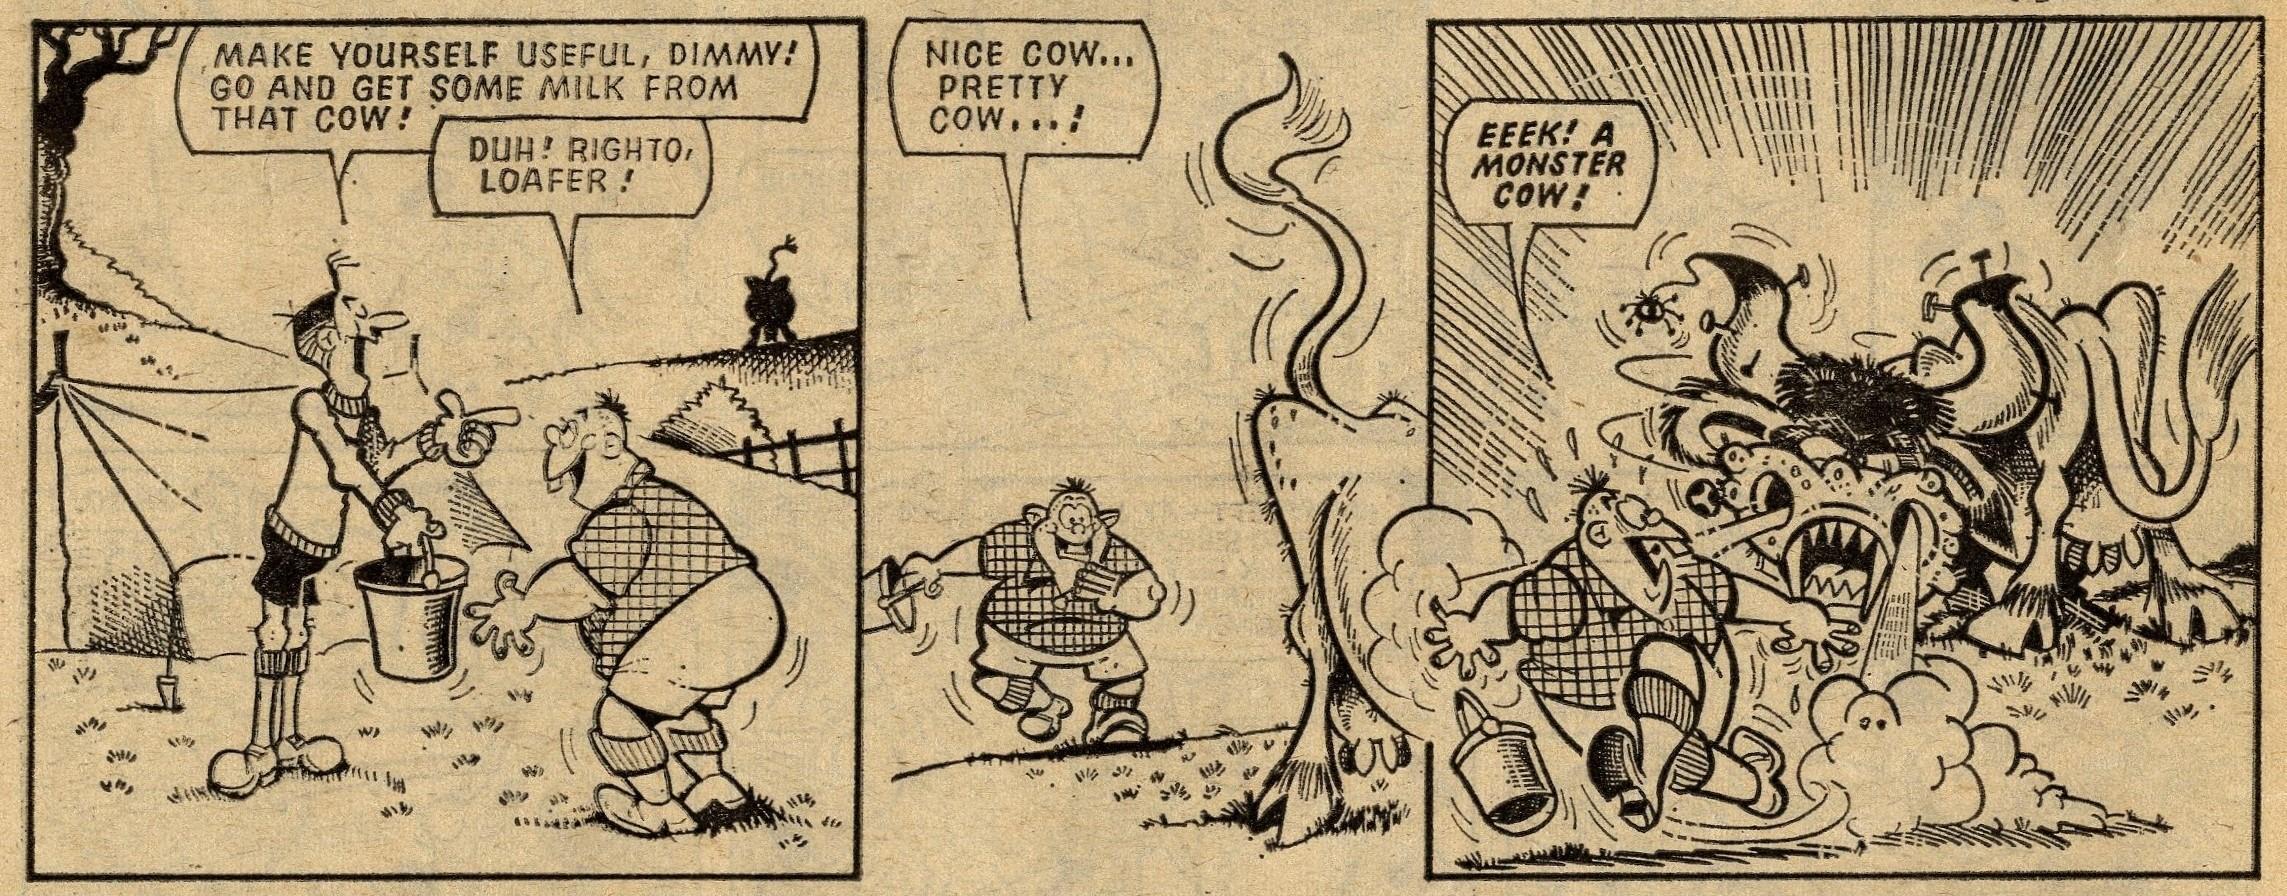 Freaky Farm: Jim Watson (artist)